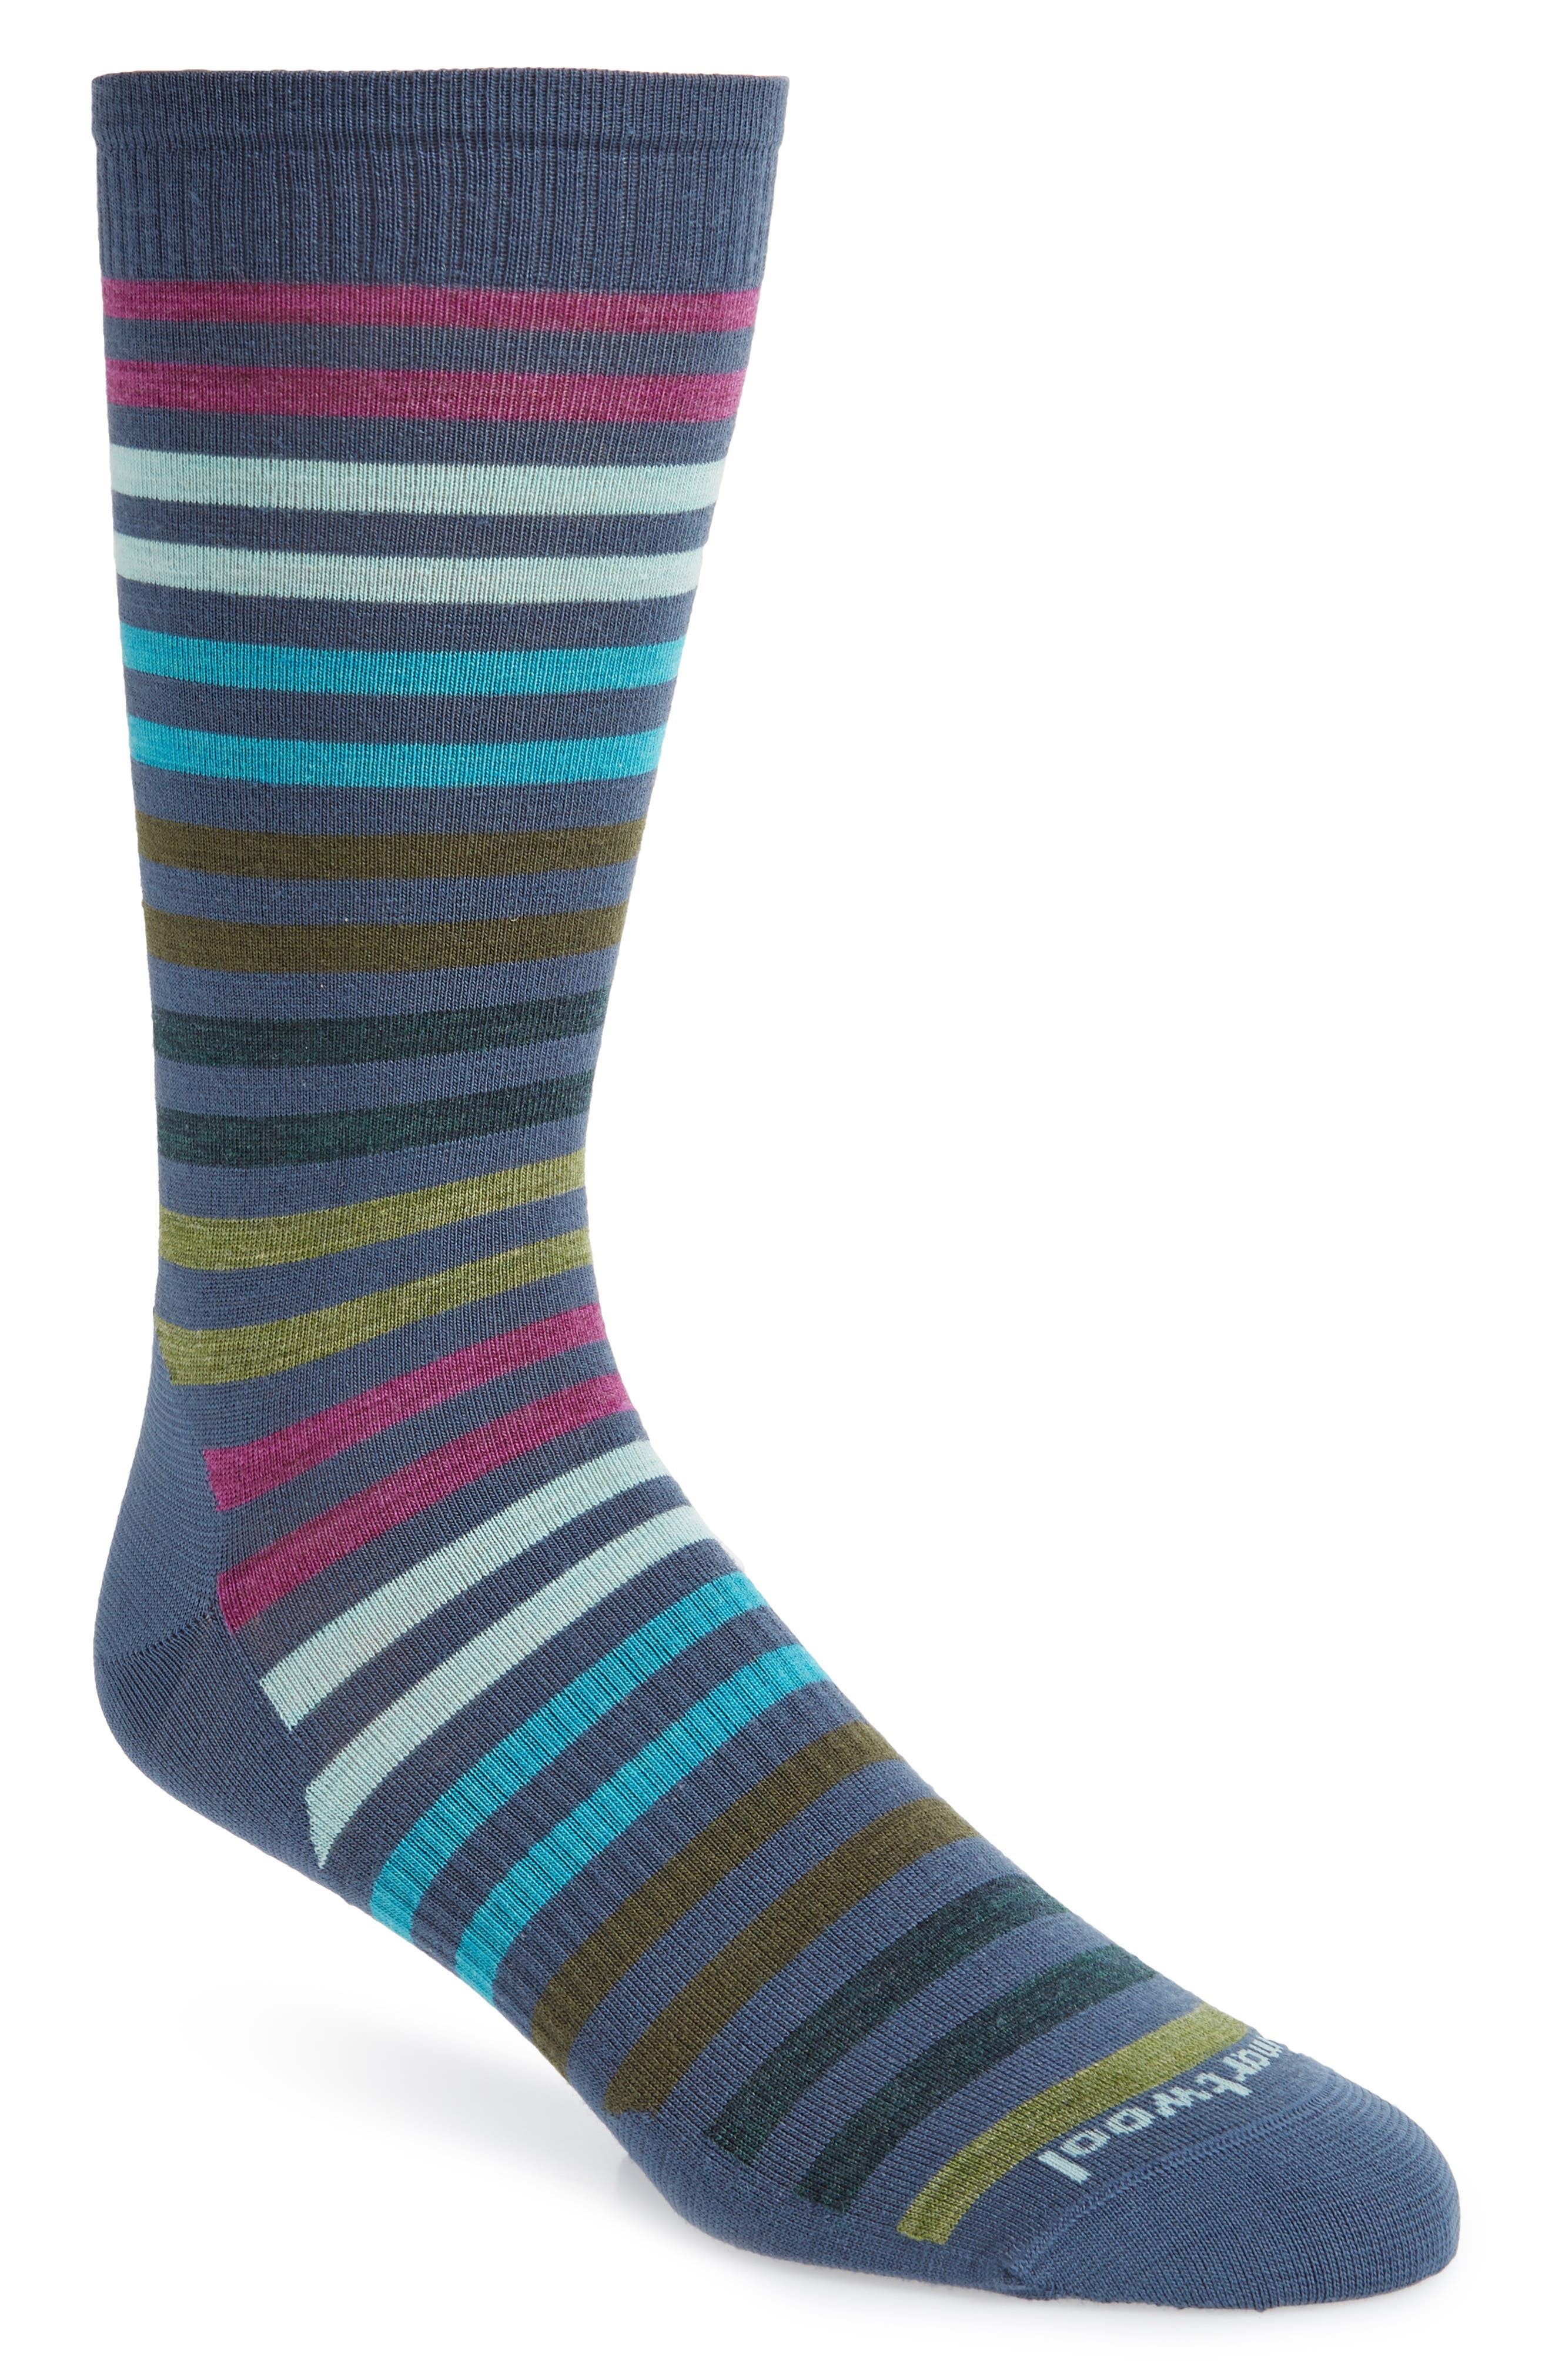 SMARTWOOL, 'Spruce Street' Stripe Merino Wool Blend Socks, Main thumbnail 1, color, DARK BLUE STEEL HEATHER